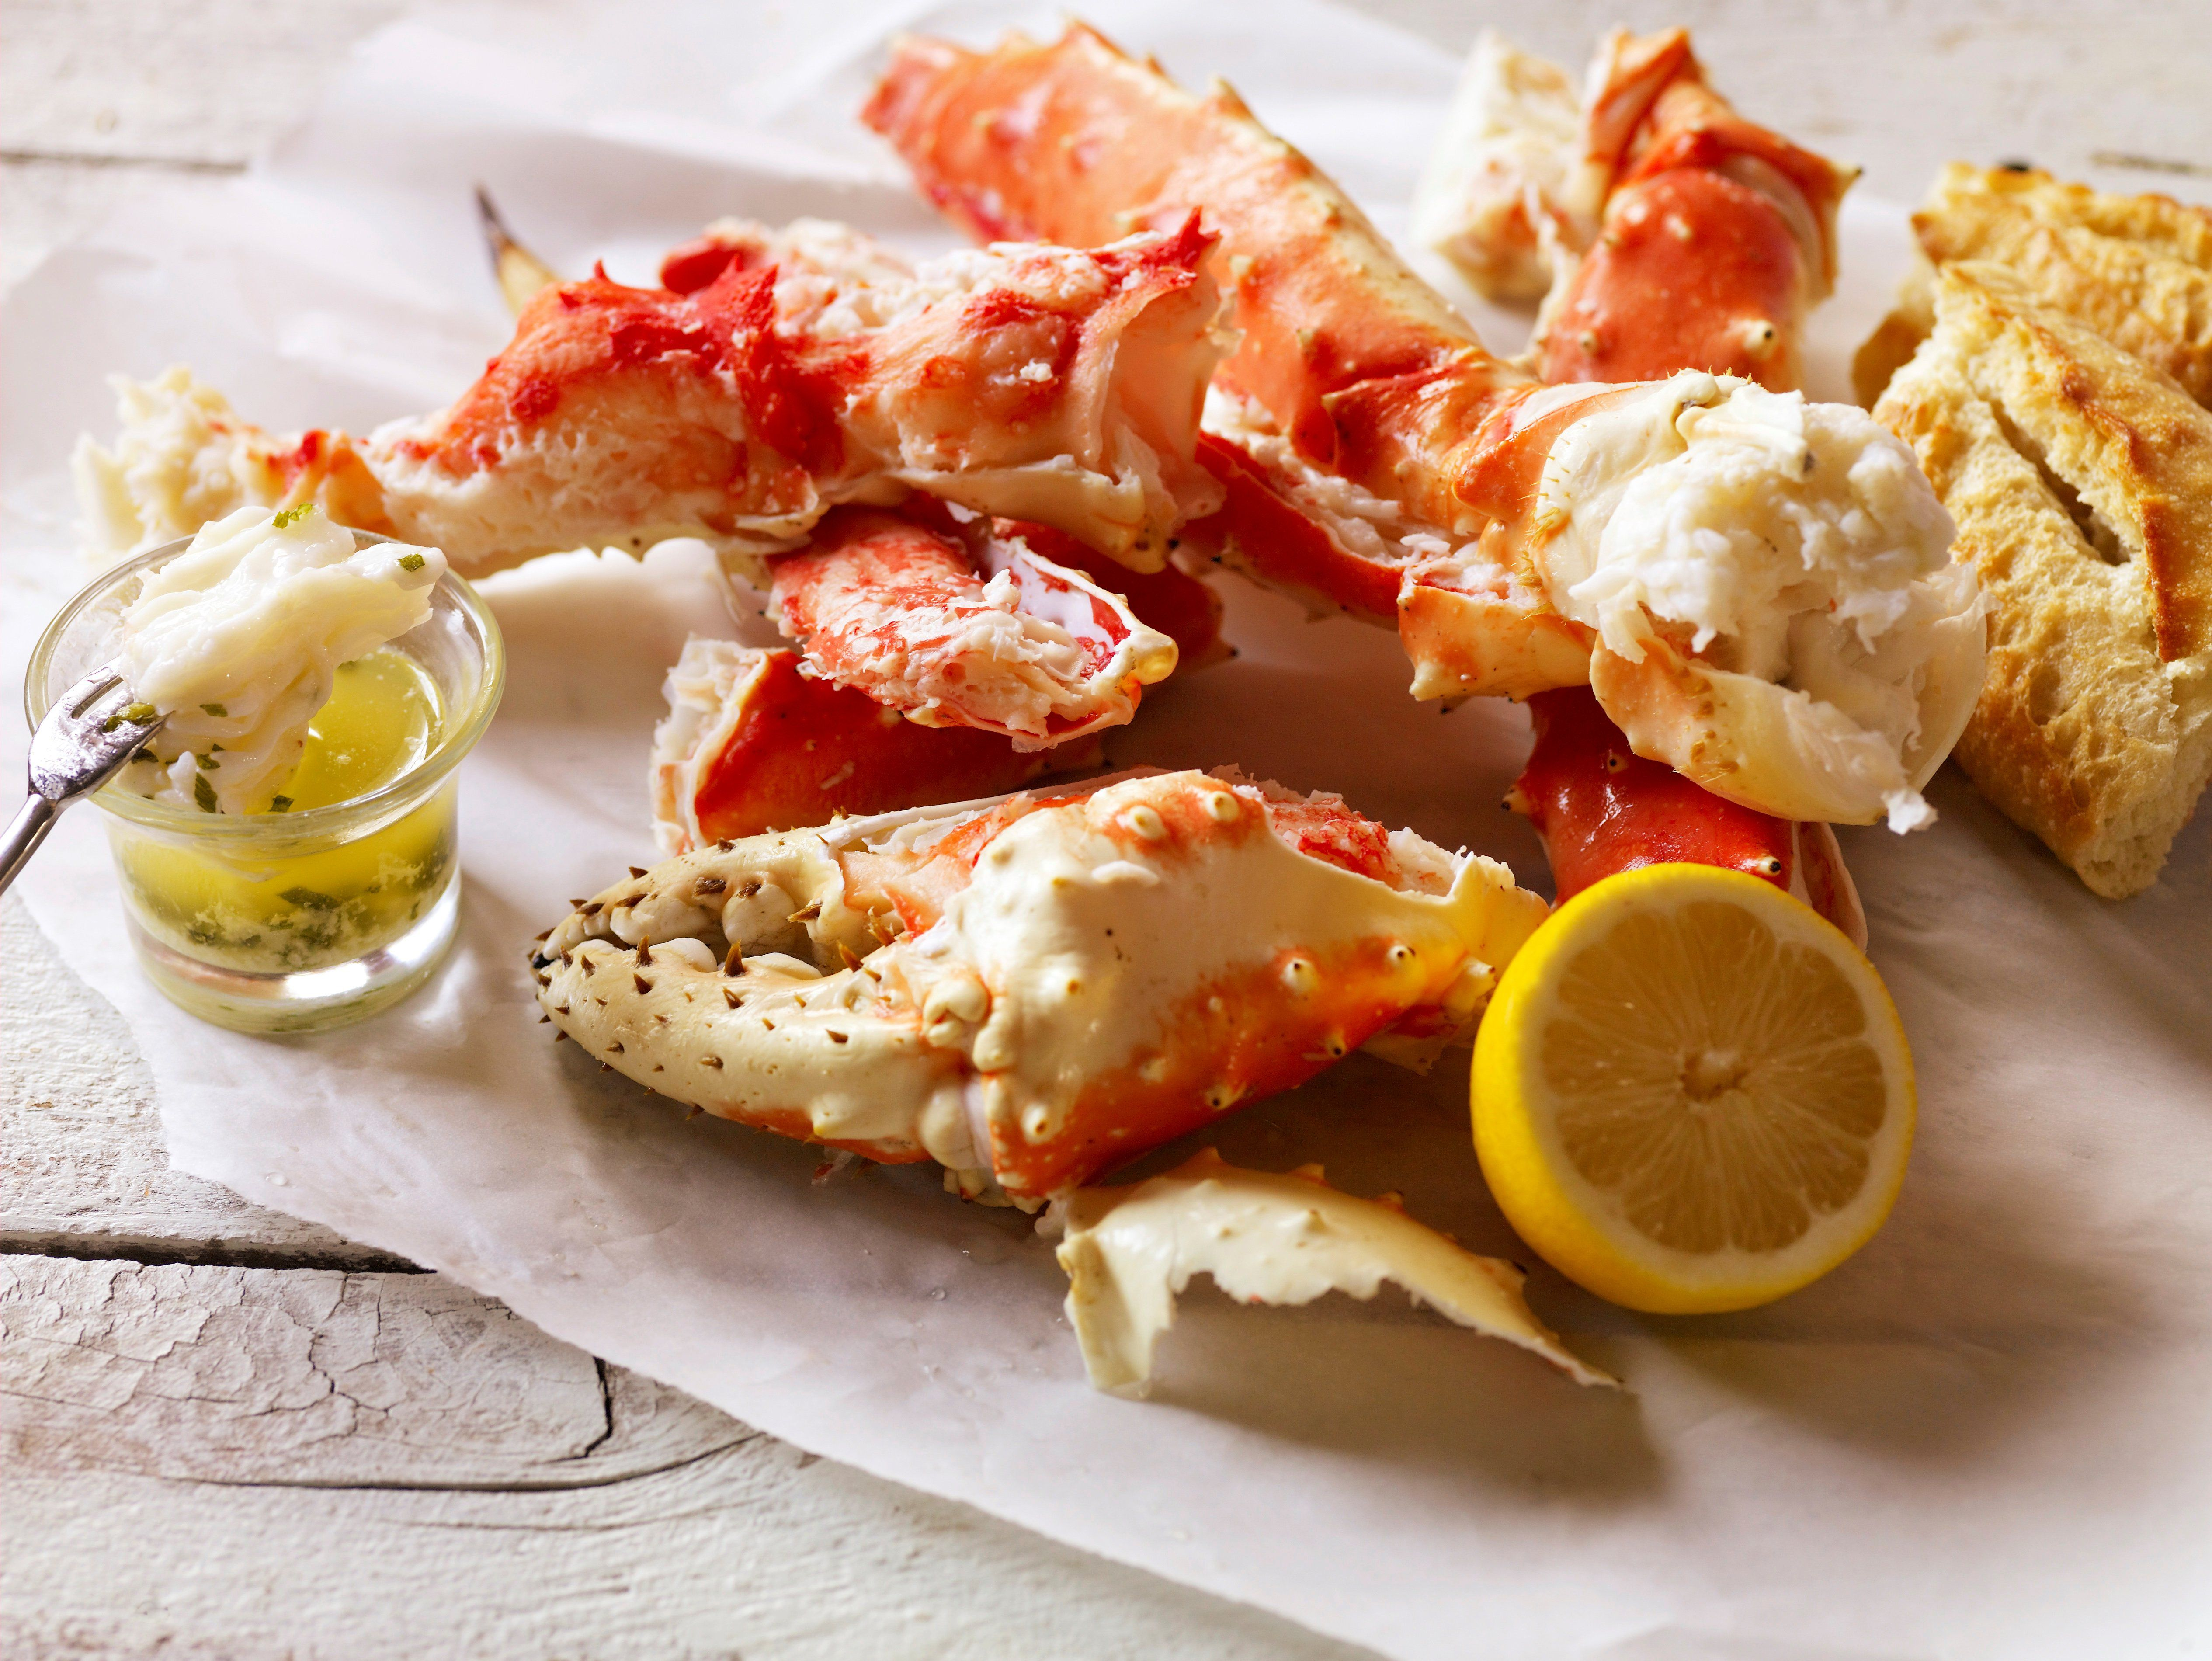 Red King Crab Selects King Crab Delicious Seafood Recipes Alaskan King Crab